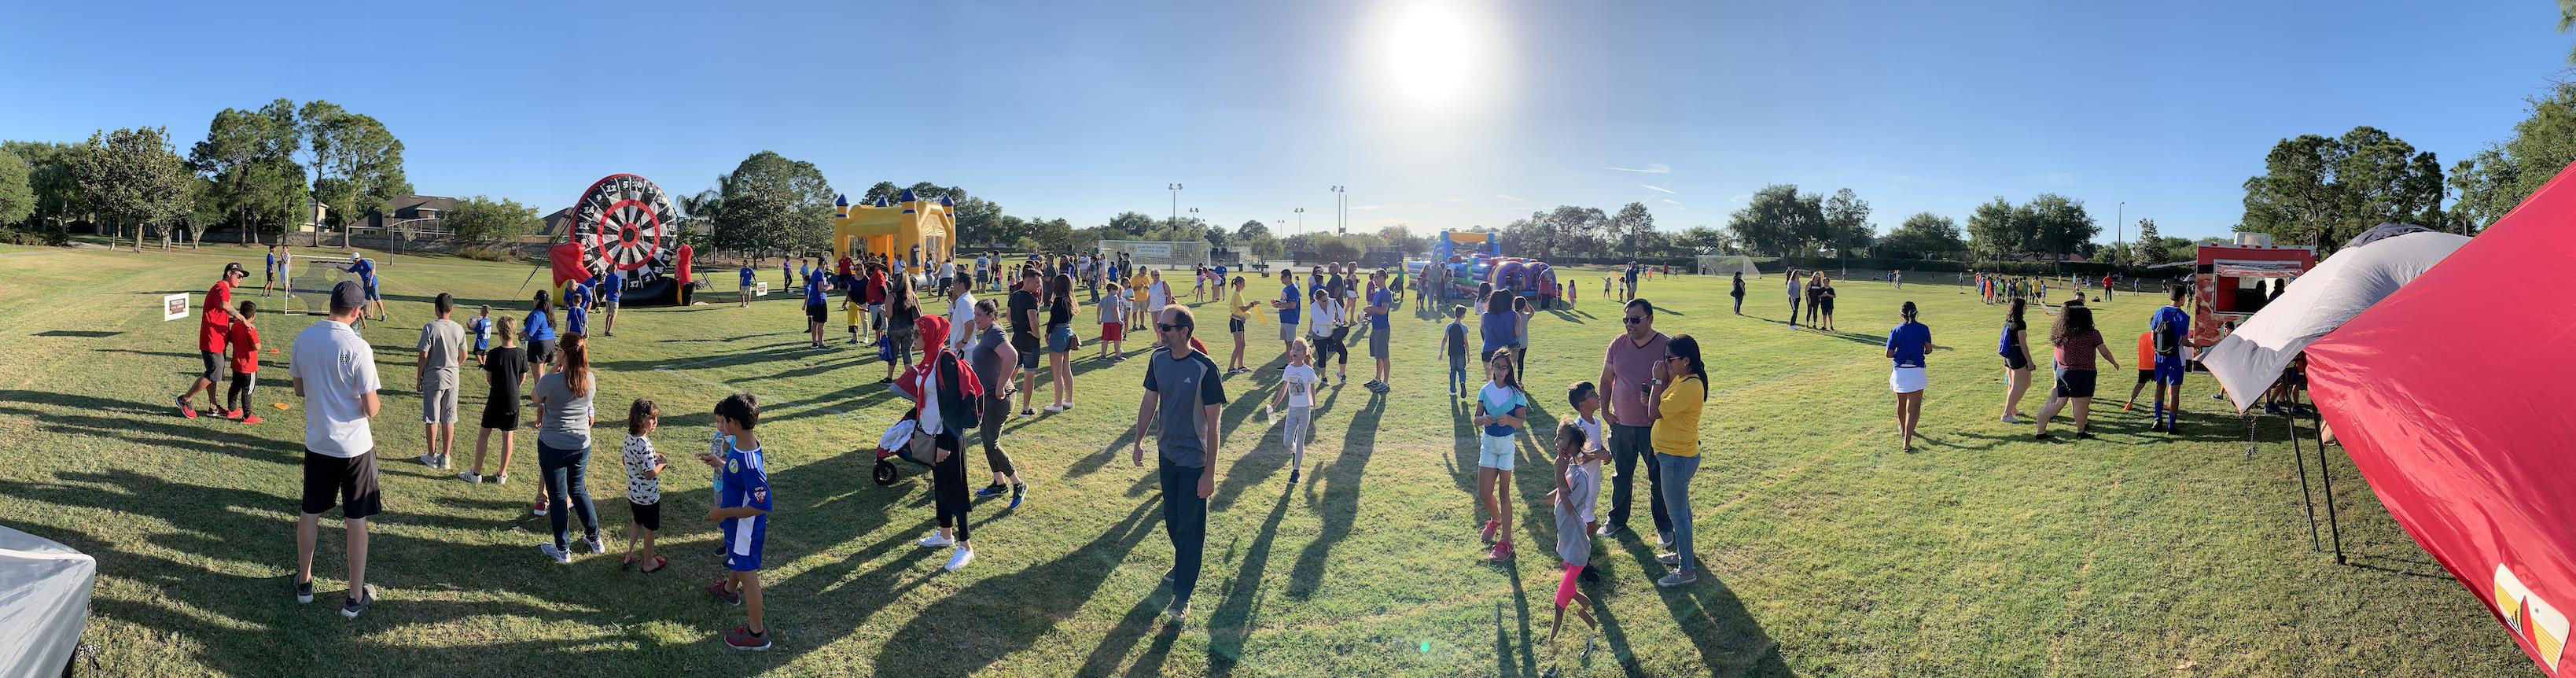 Hunter's Creek Soccer Club Volunteer